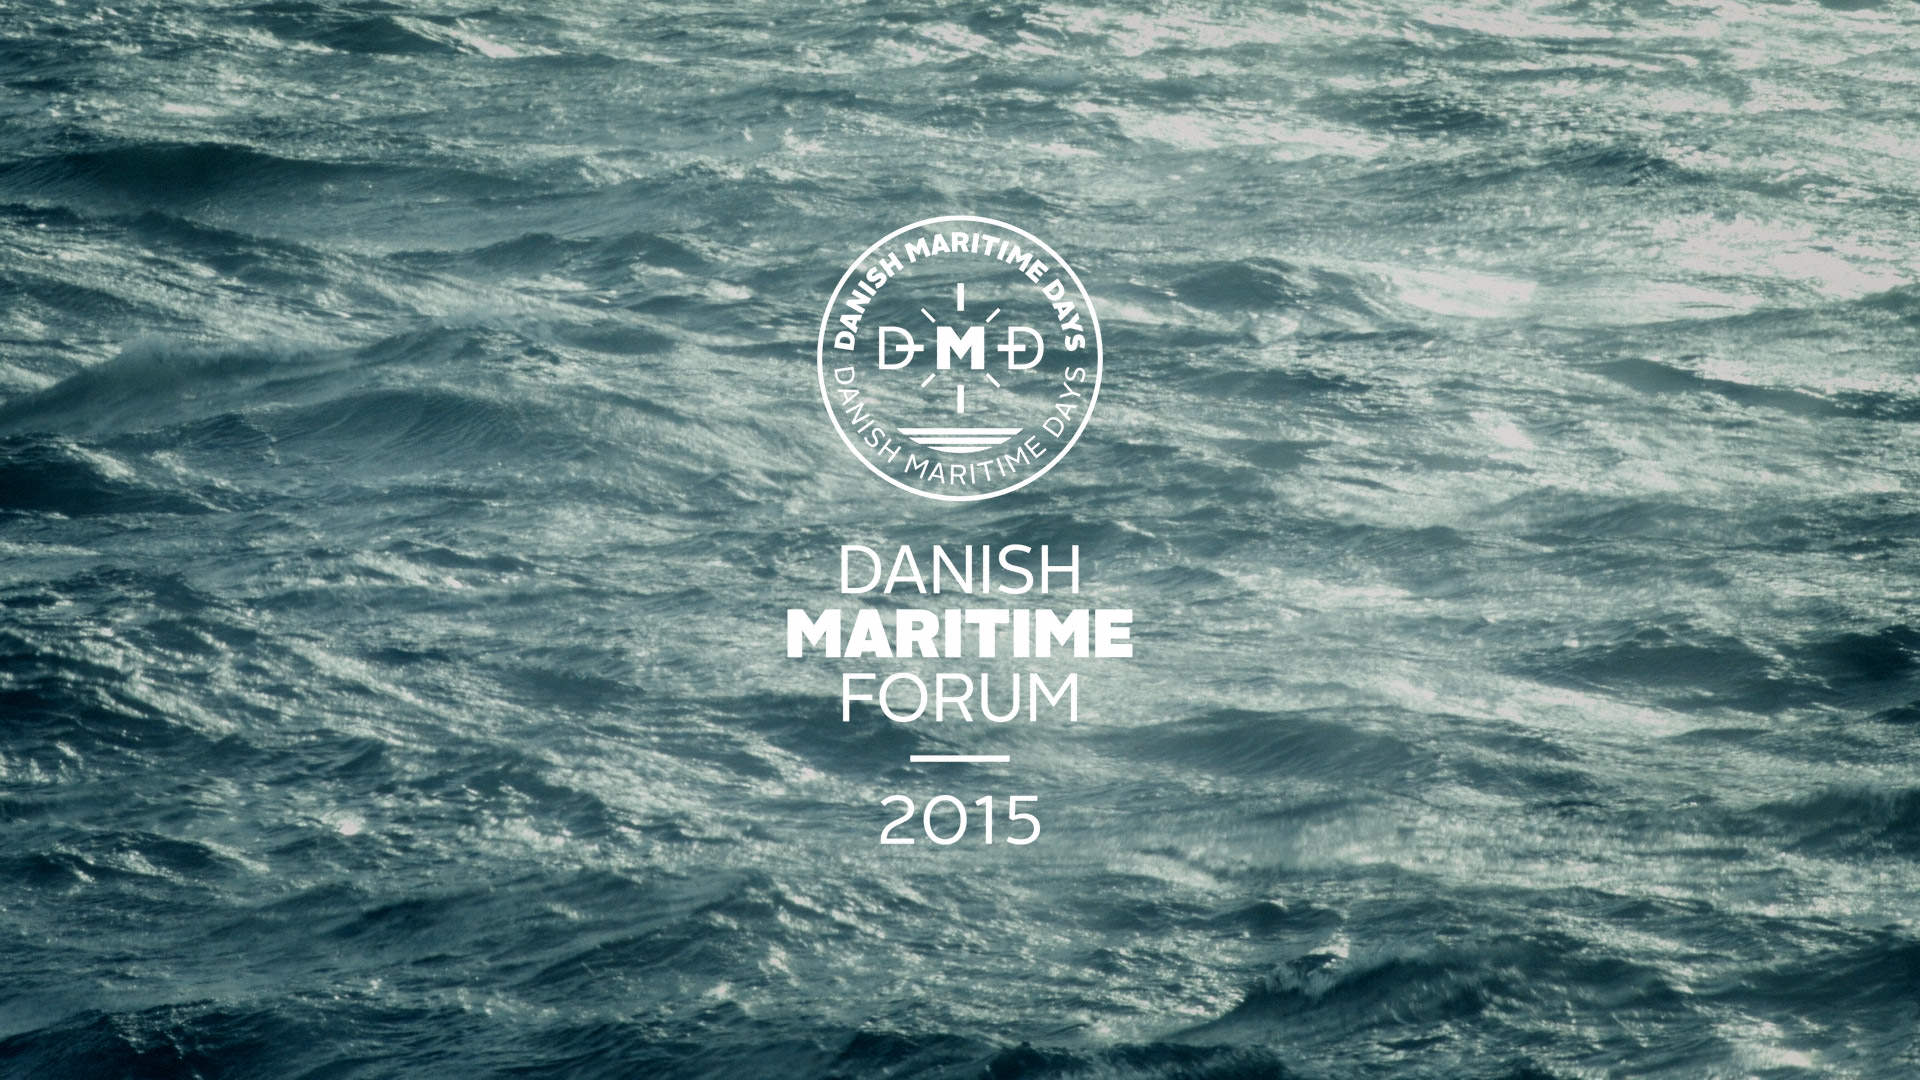 Danish Maritime Forum 2015